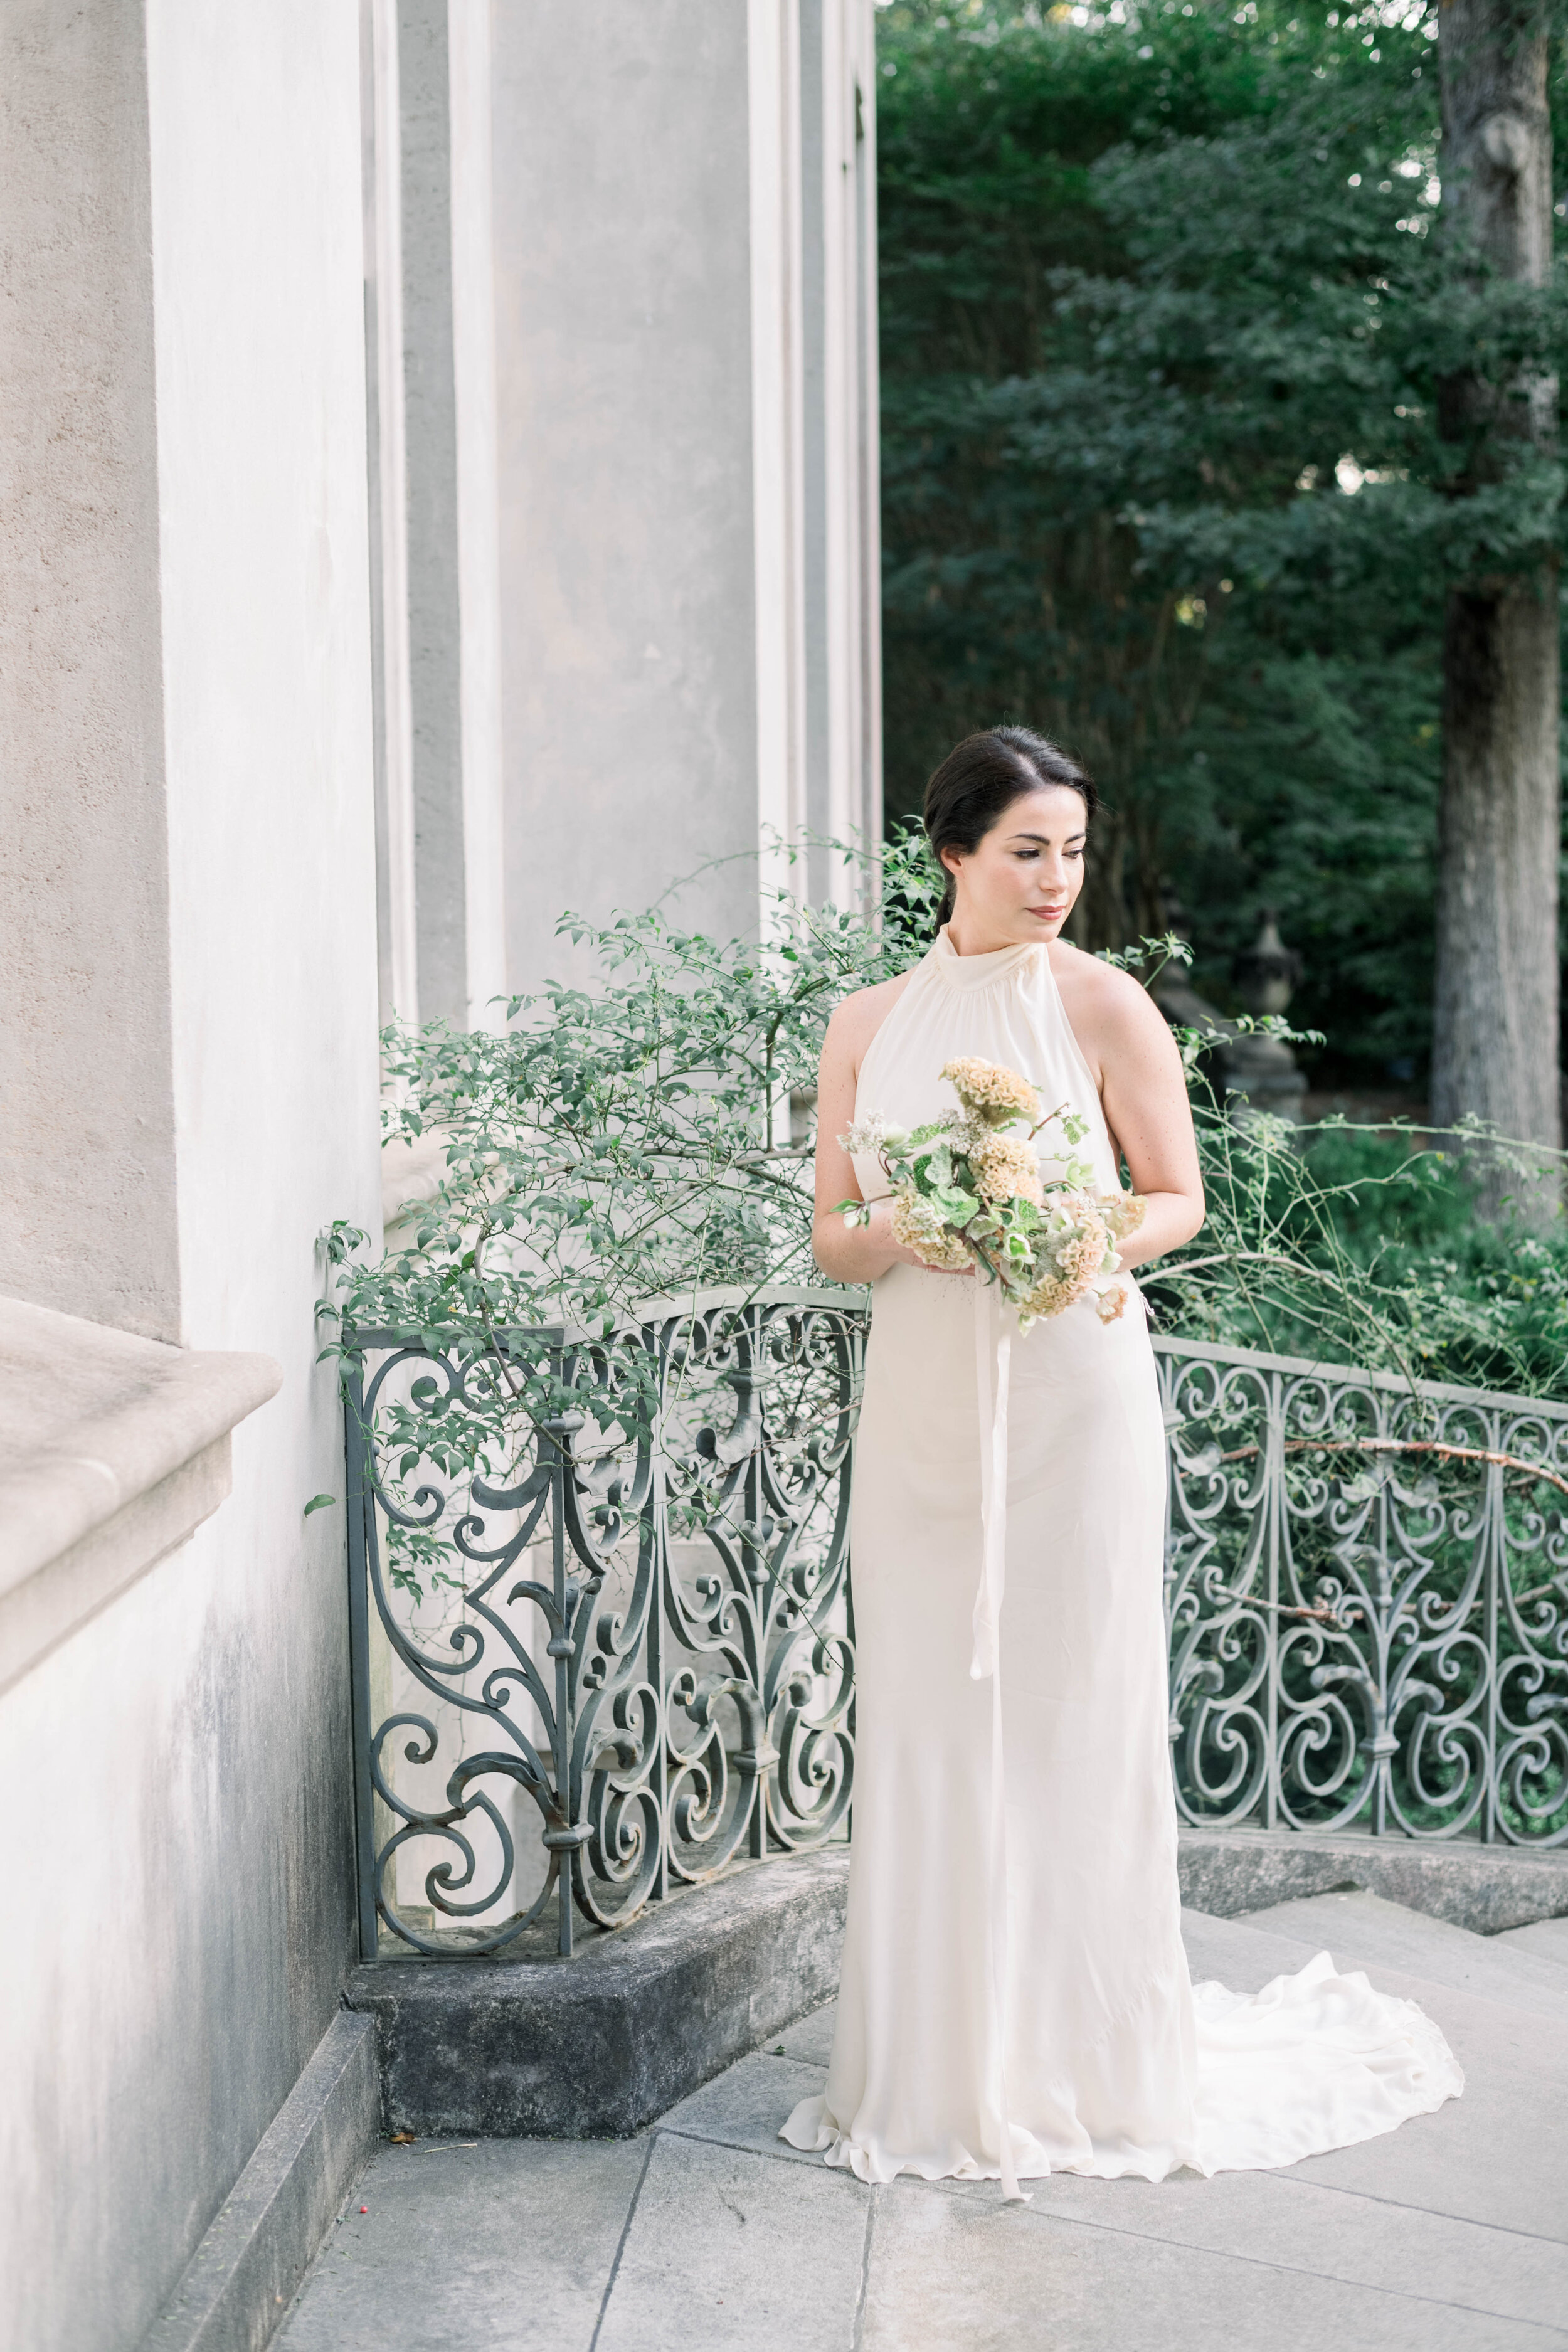 fine art wedding, Atlanta wedding, swan house wedding, modern wedding, rolls Royce wedding, swan house, high neck wedding dress, white tux, bridal portrait